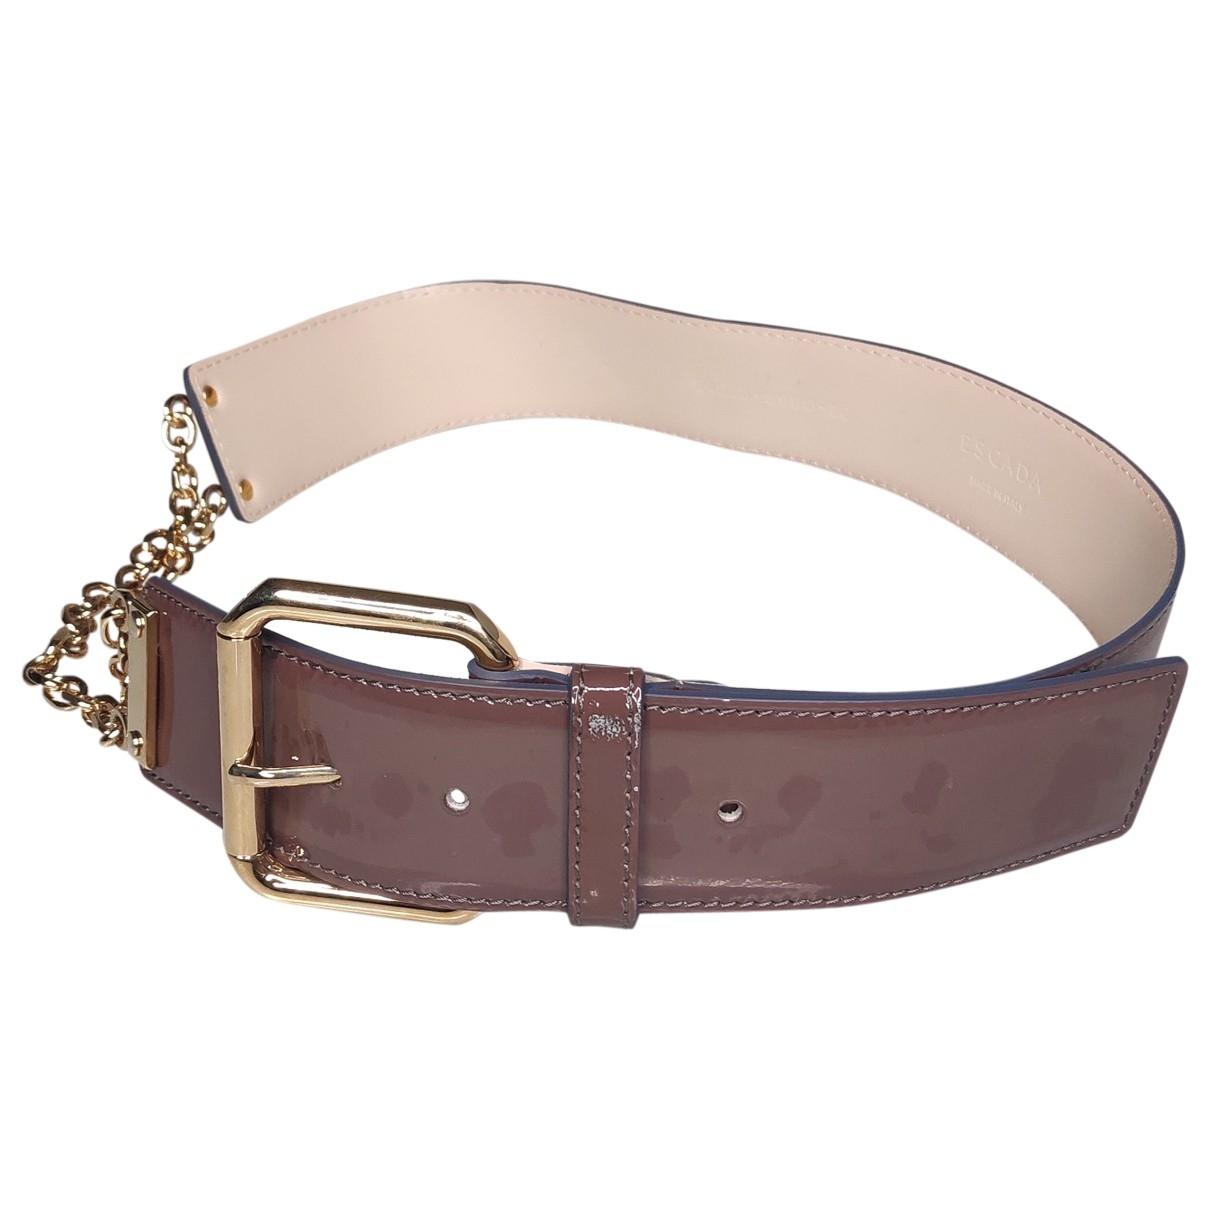 Escada \N Purple Patent leather belt for Women S International